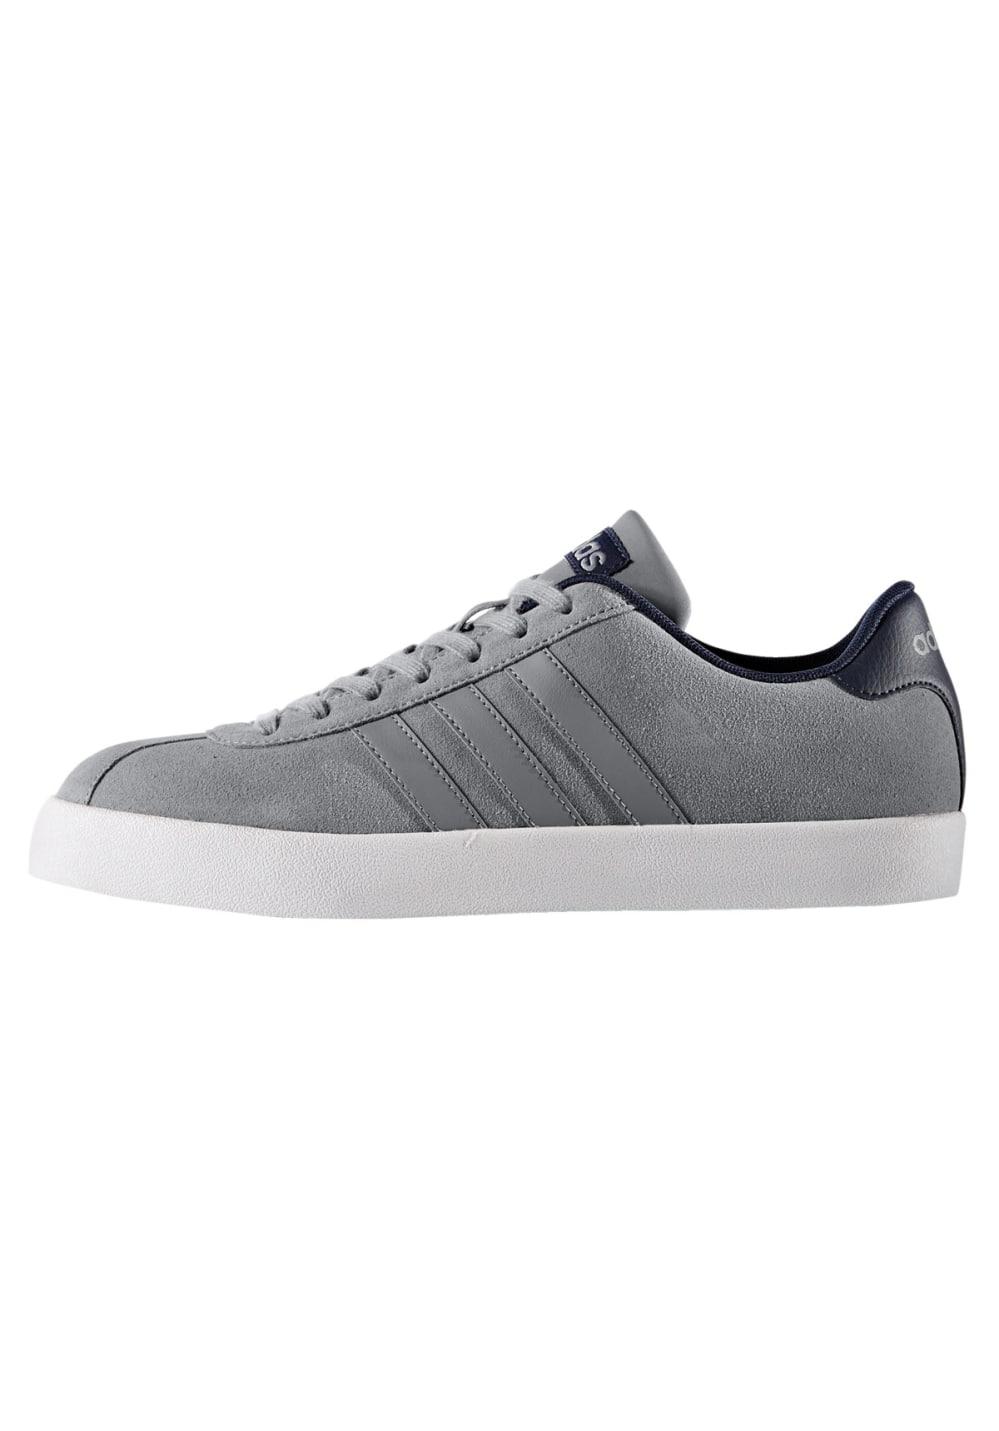 adidas neo VL Court Vulc Sneaker for Men Grey